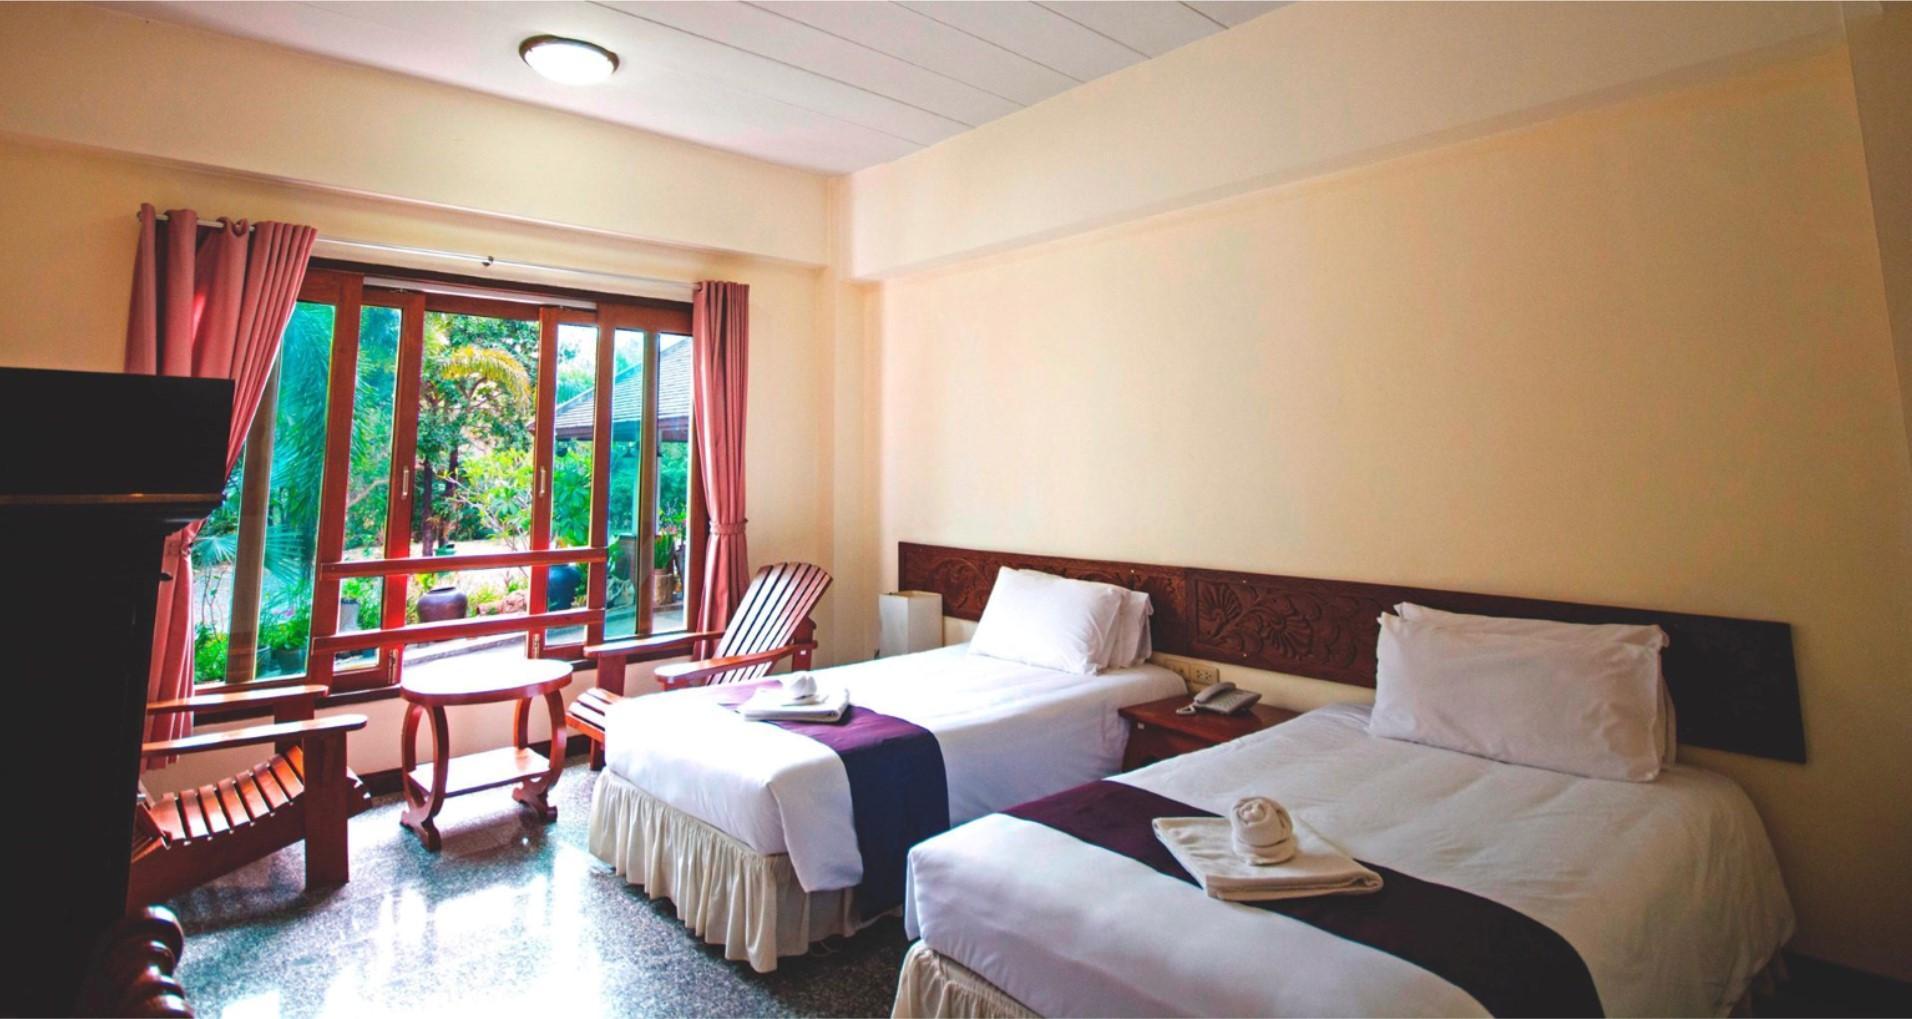 Tak Andaman Resort & Hotel (Tak), Muang Tak